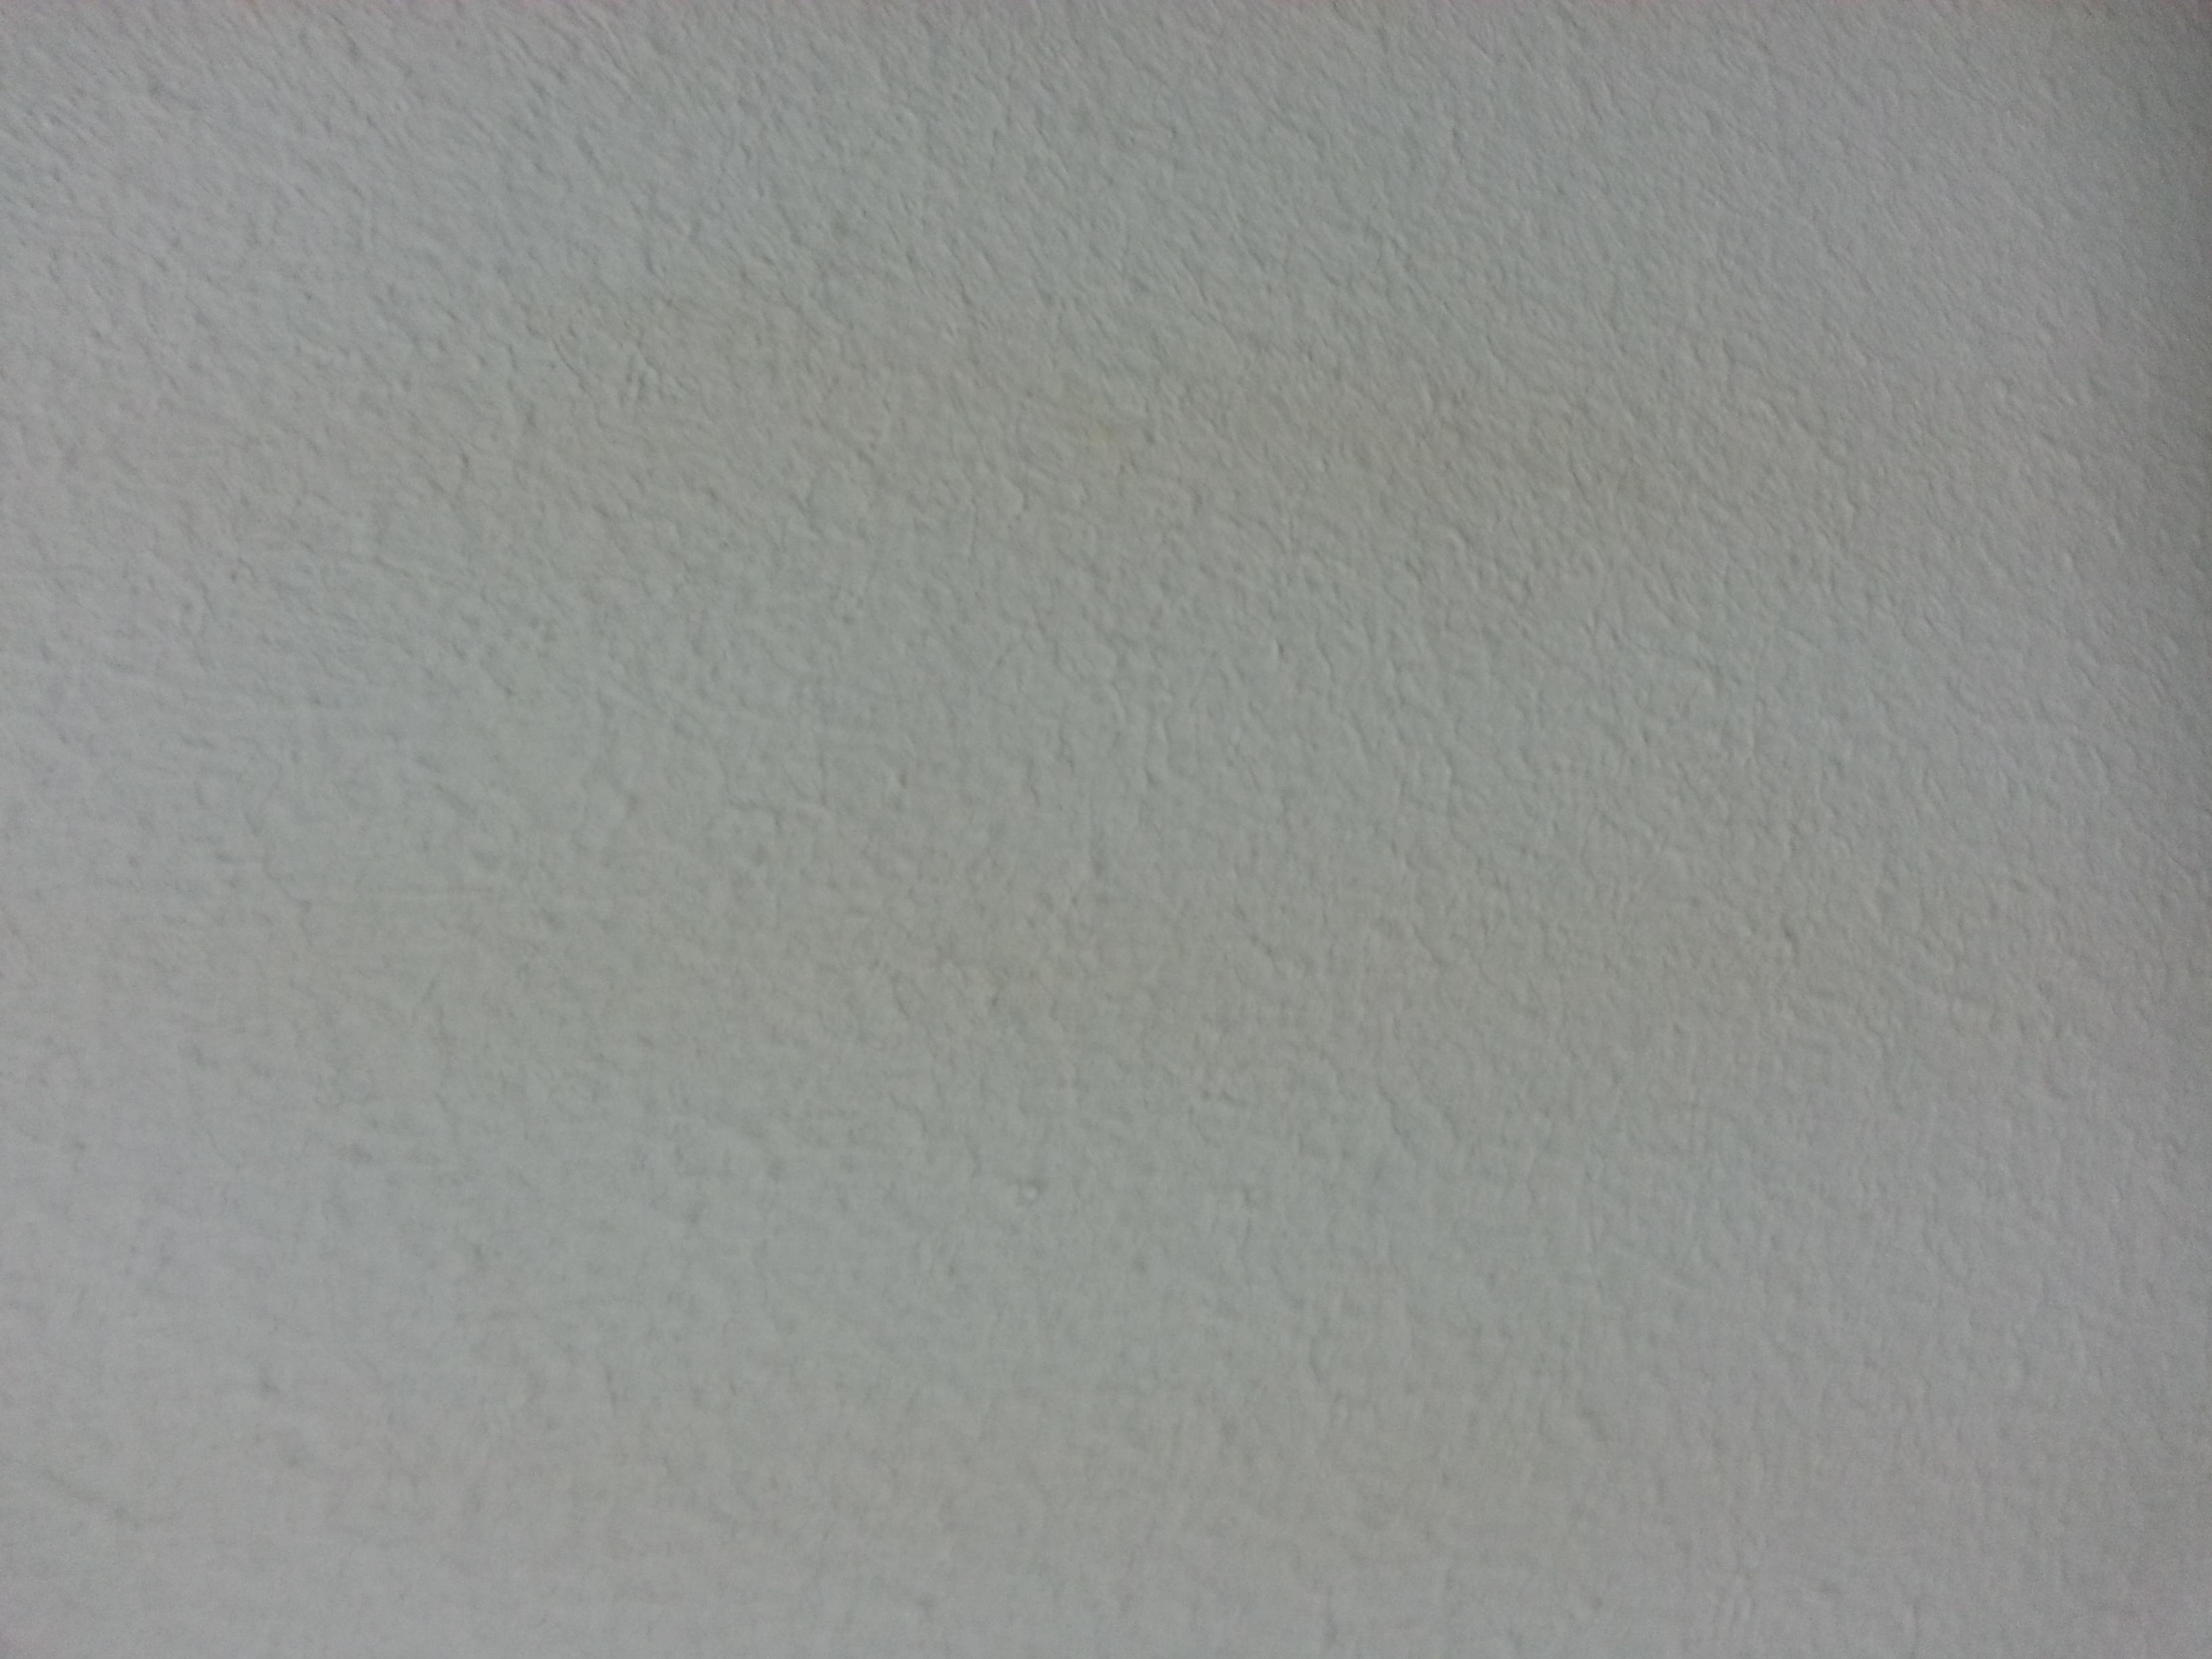 datei:weiße wand – wikipedia